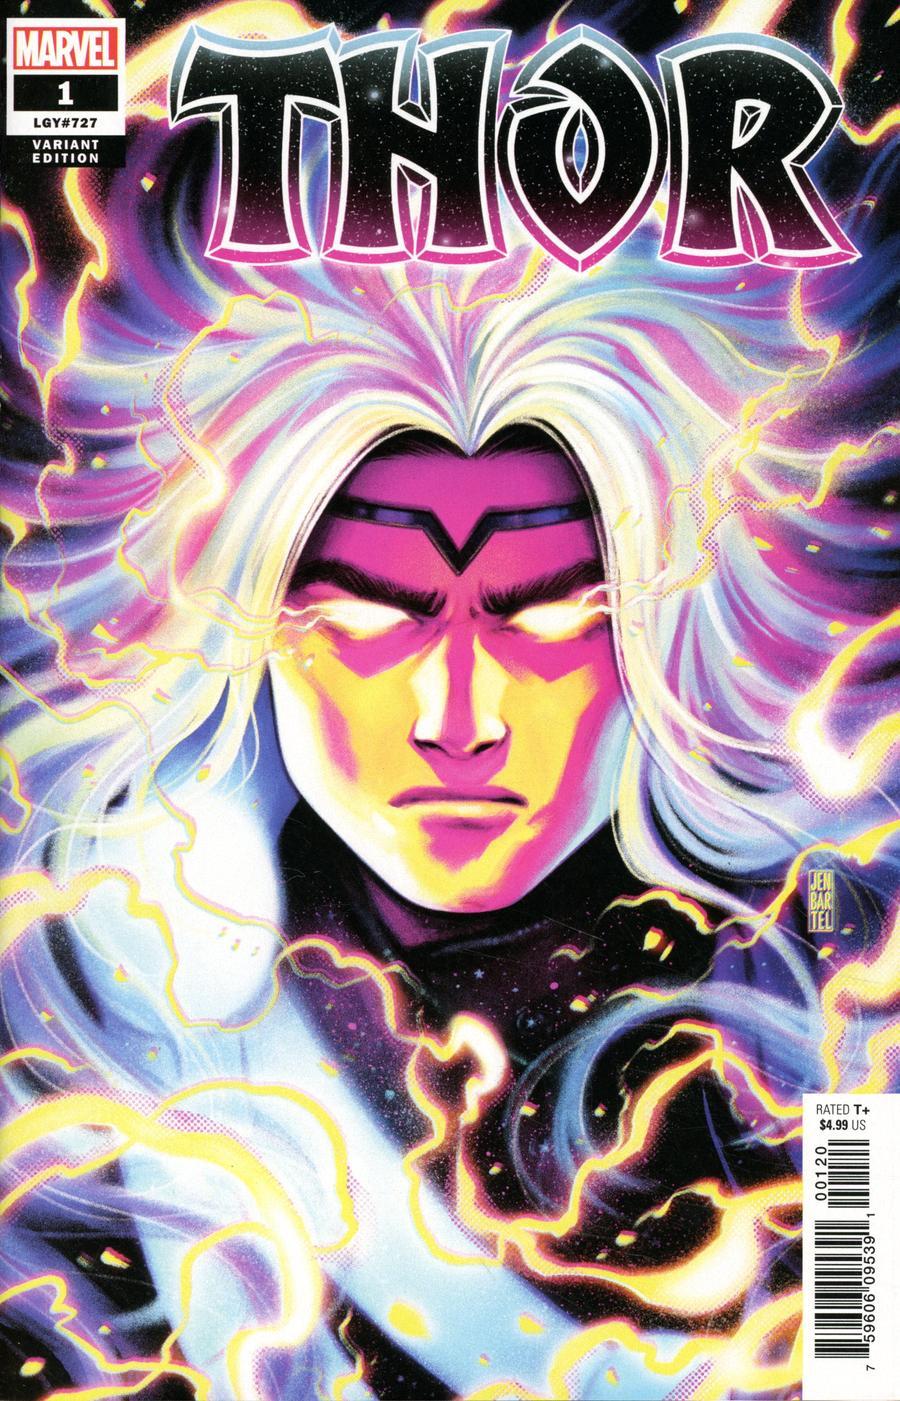 Thor Vol 6 #1 Cover F Variant Jen Bartel Cover